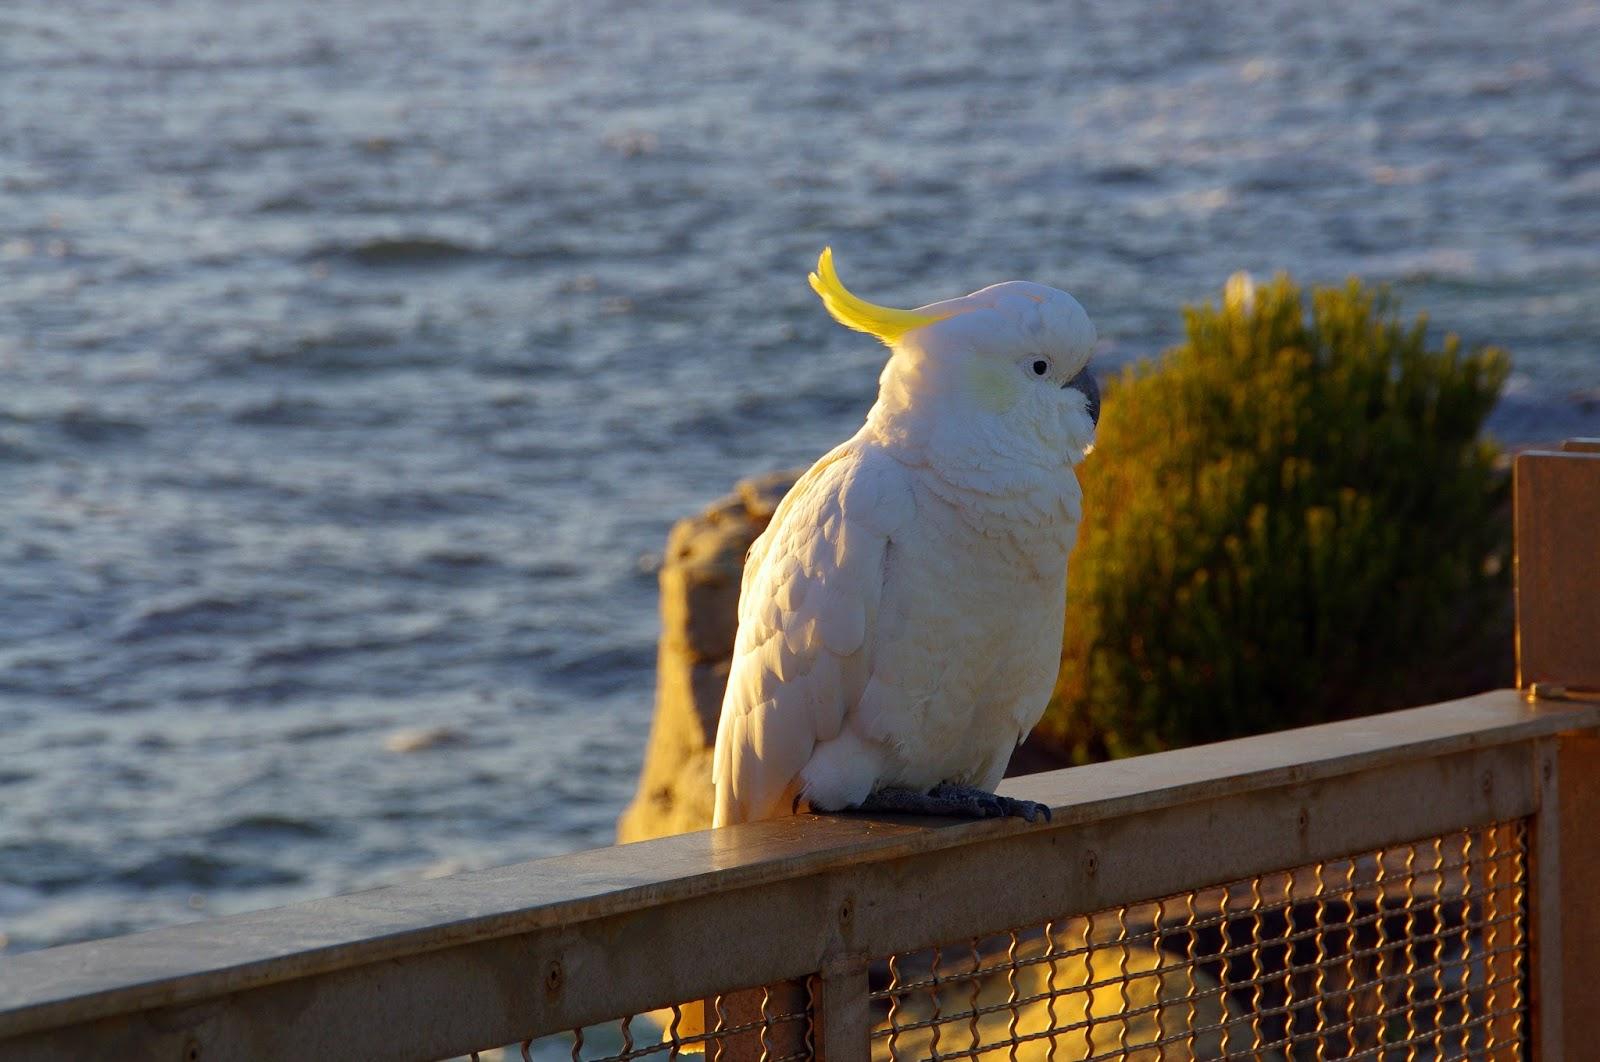 cockatoo at Sydney harbour national park